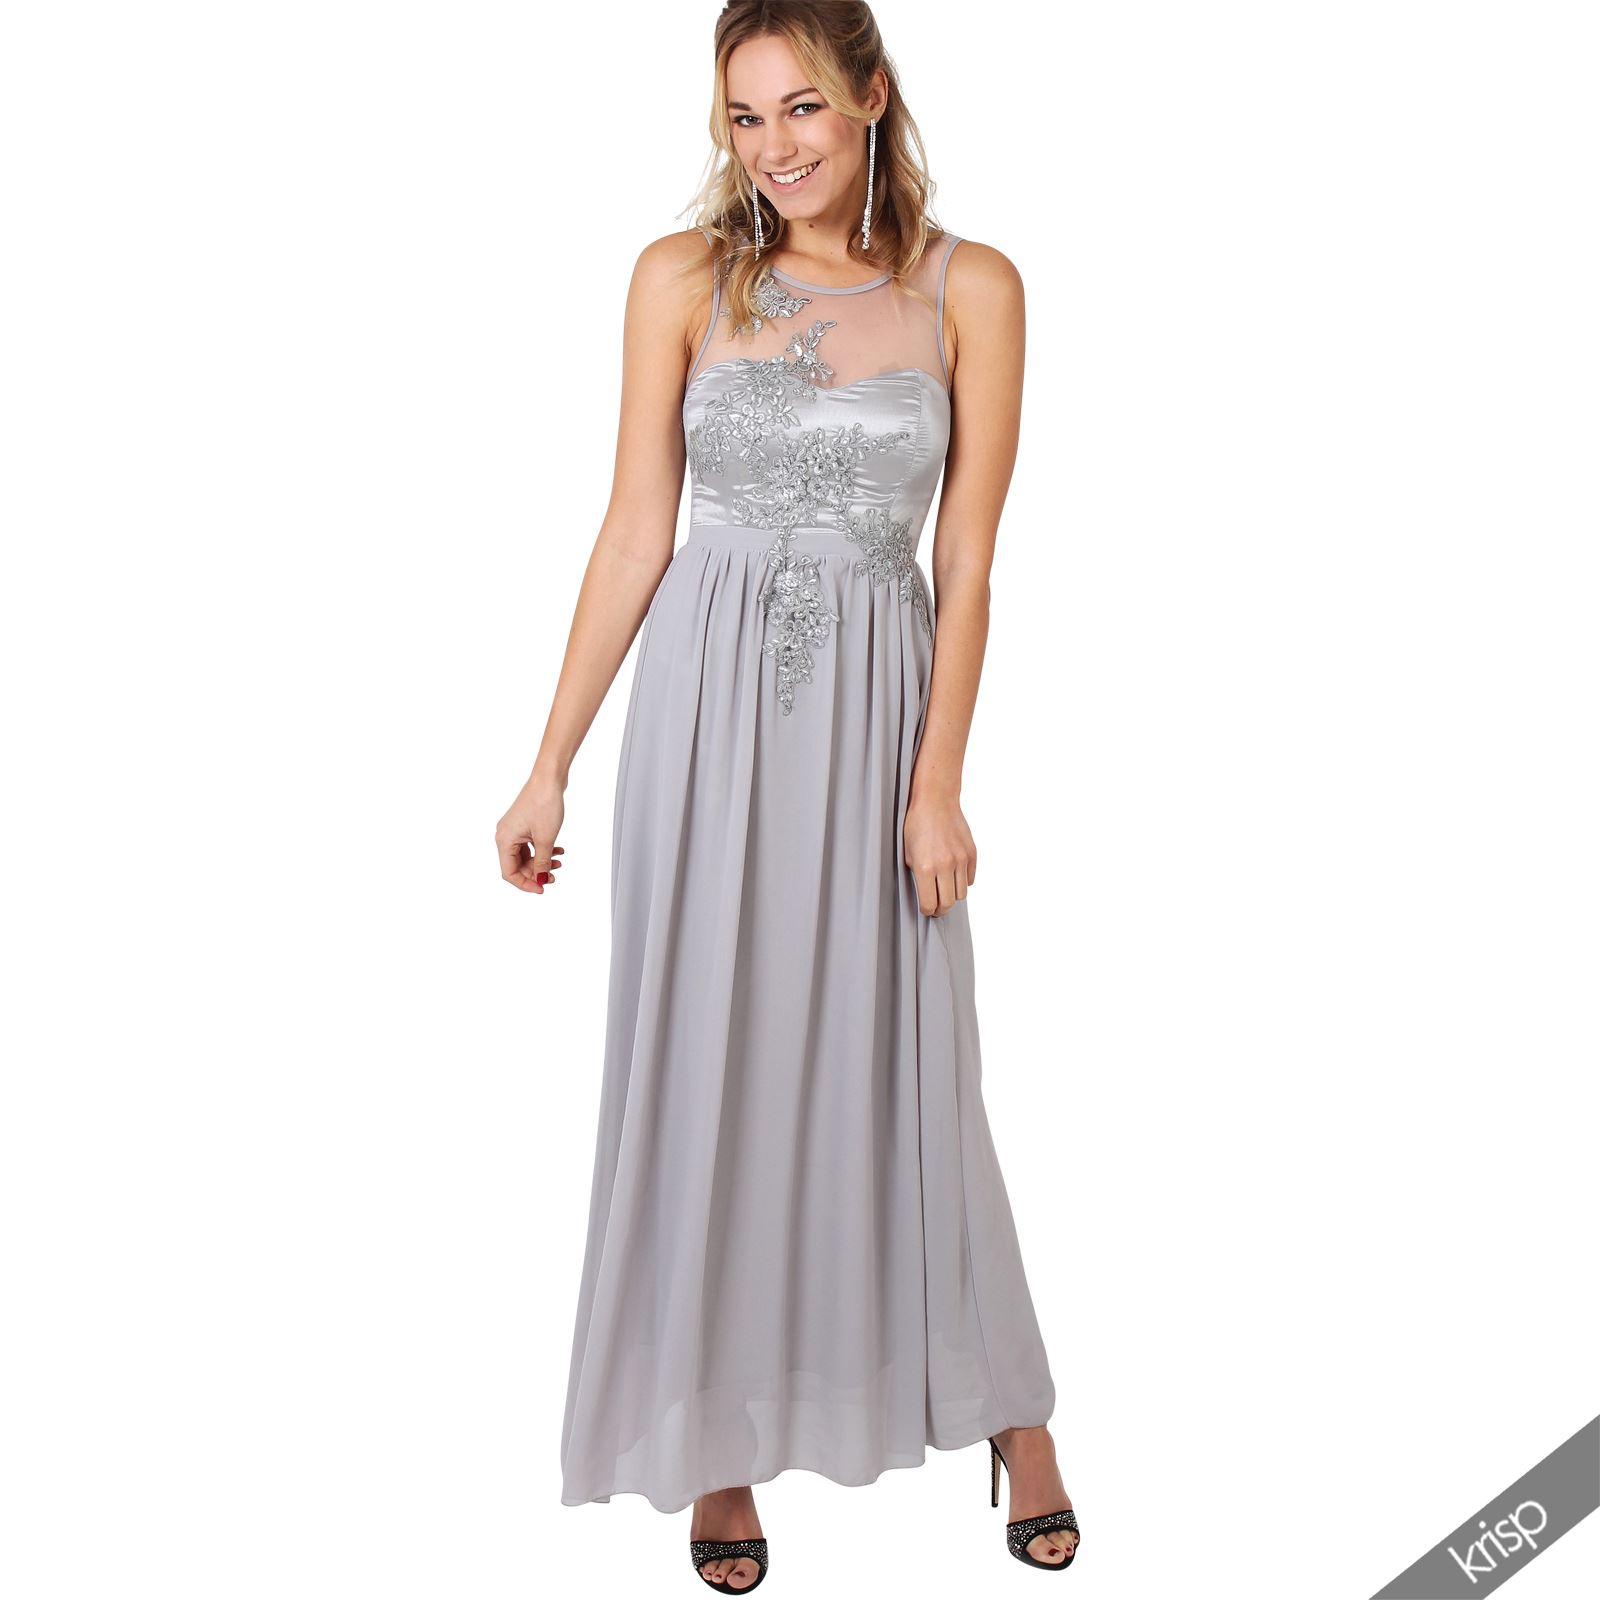 krisp femme robe longue de soir e chic fete ebay. Black Bedroom Furniture Sets. Home Design Ideas